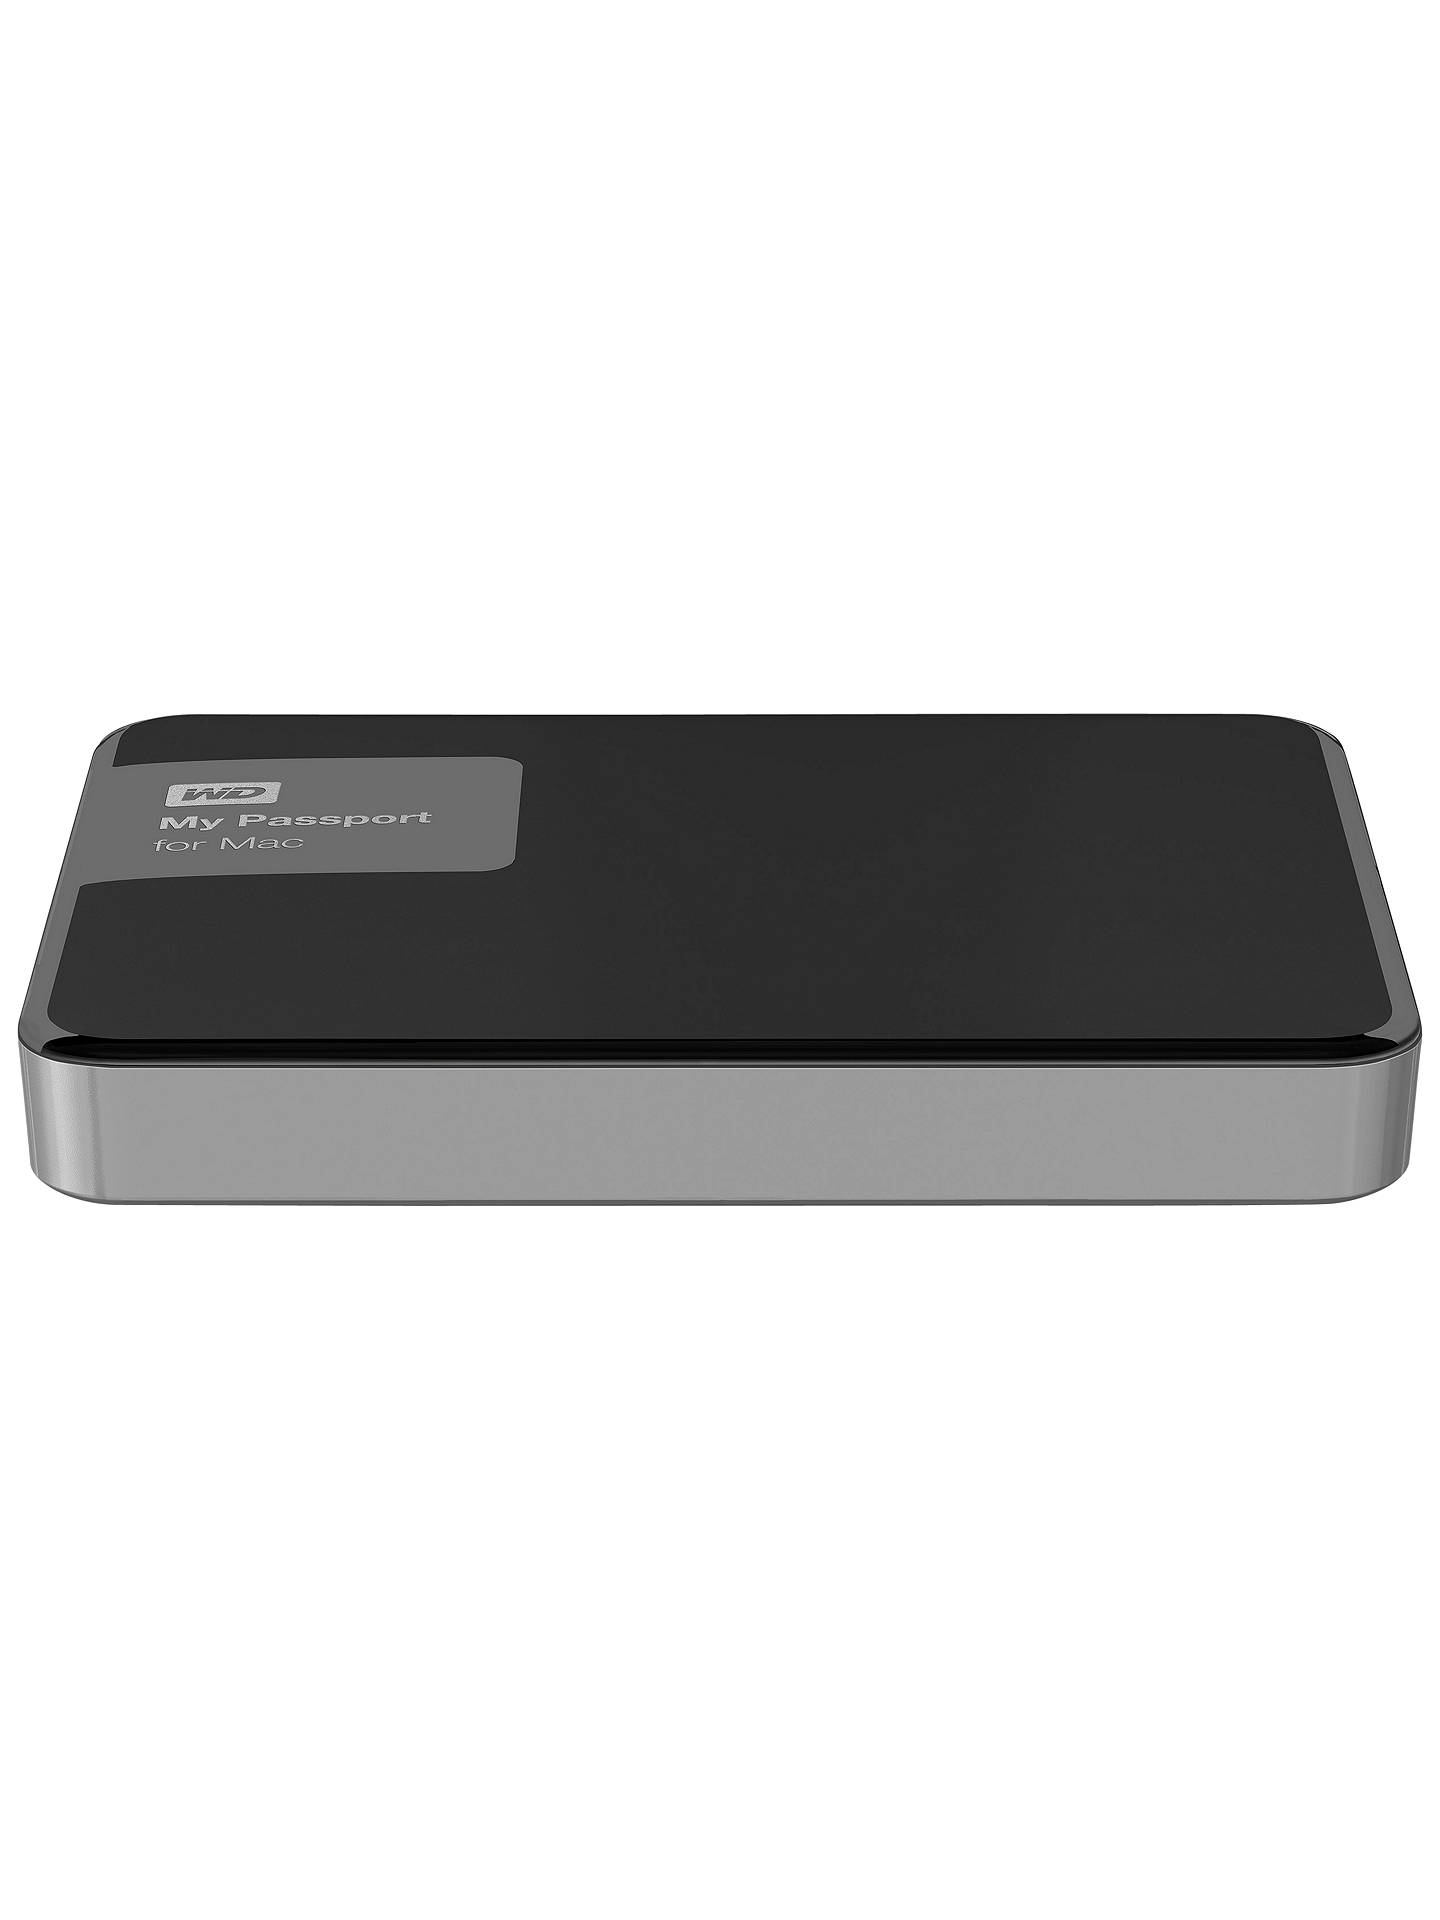 WD My Passport Ultra Portable Hard Drive For Mac, USB 3 0